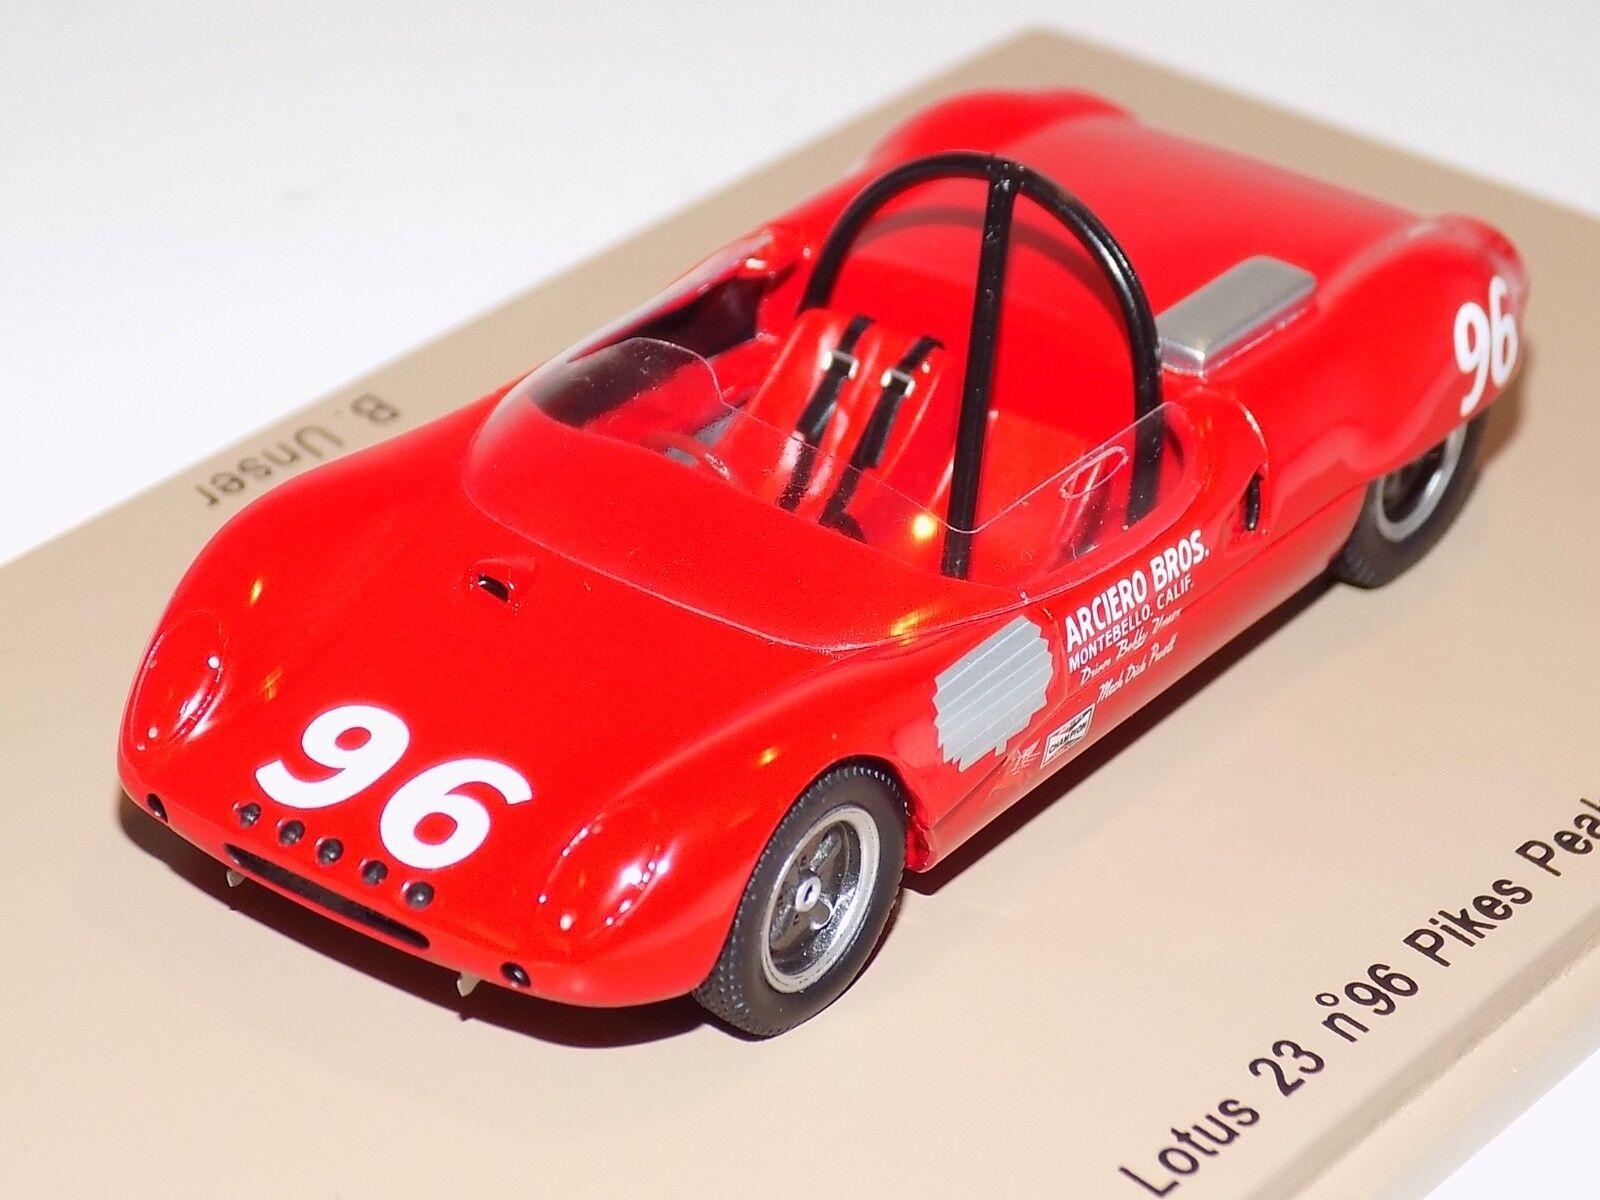 1/43 Spark Models Lotus 23 Car  96 of Bobby Unser Pikes Peak 1964 PP003